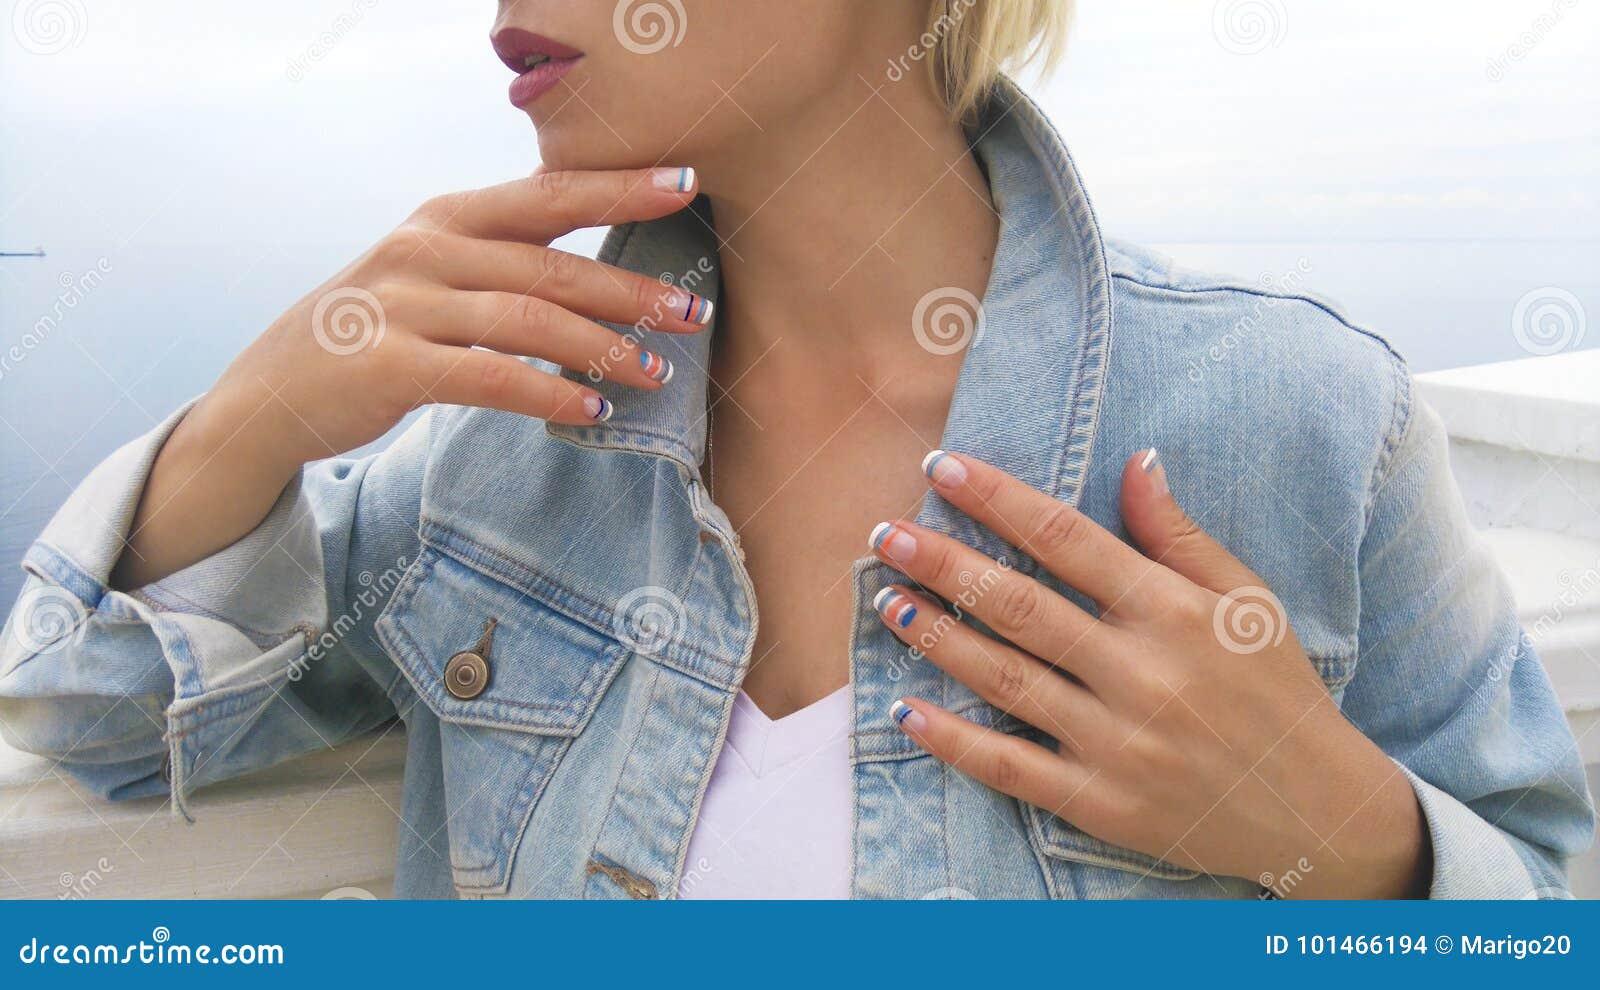 Marine French nail designs .